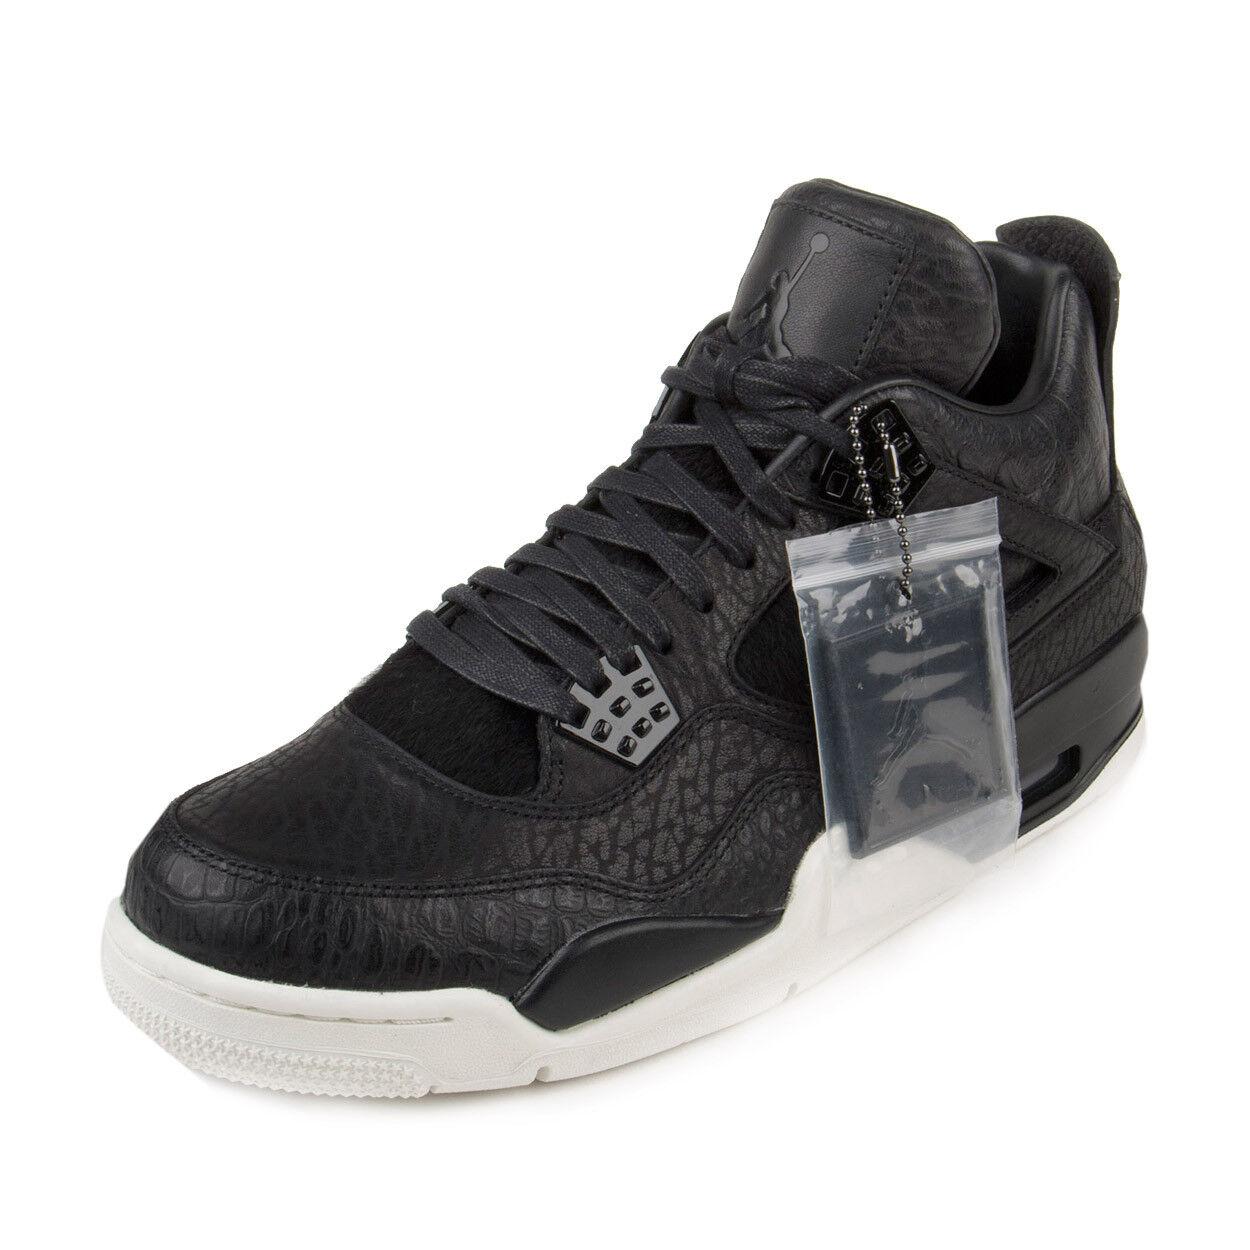 Nike Hommes Air Jordan 4 Retro Premium